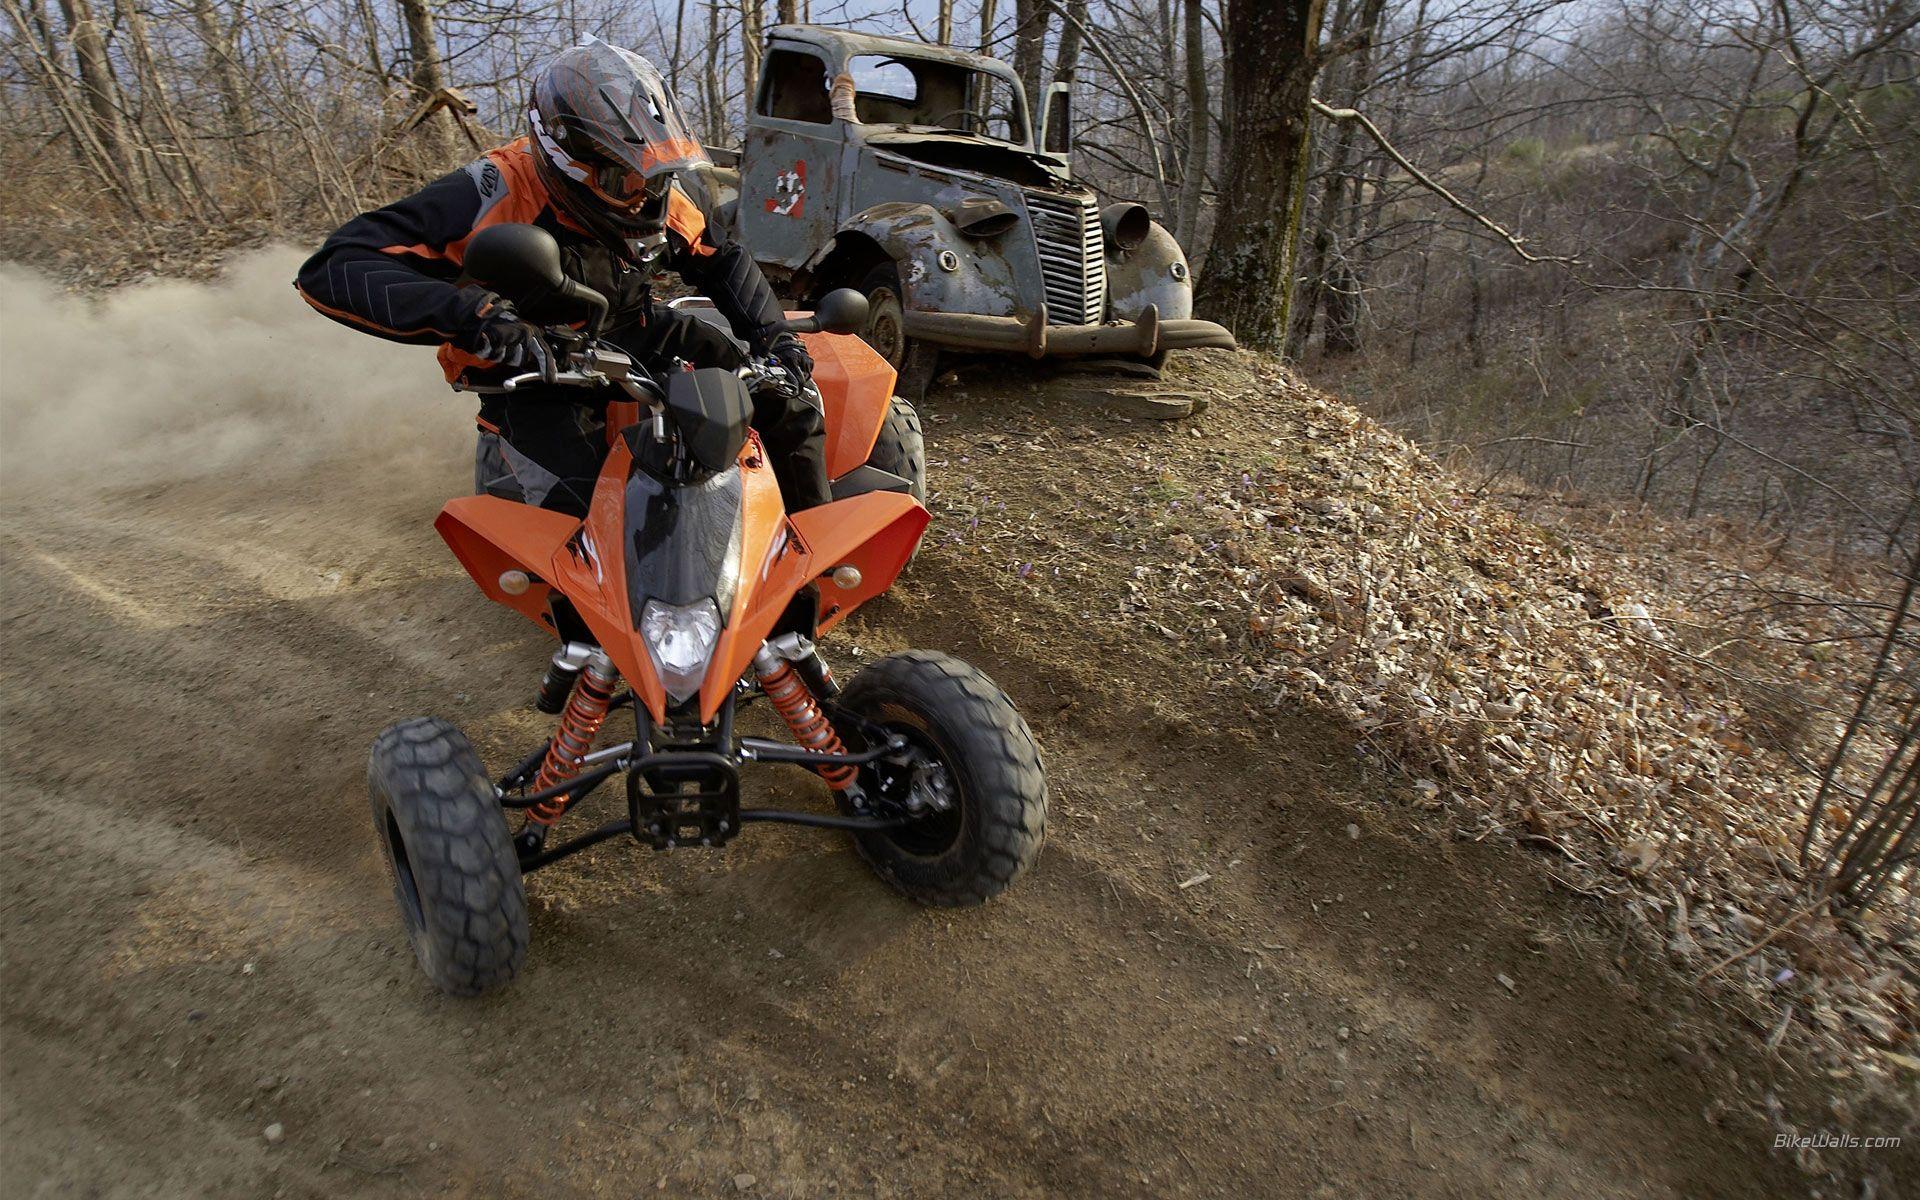 ktm 450 atv | atv | pinterest | ktm 450, atv and dirt biking